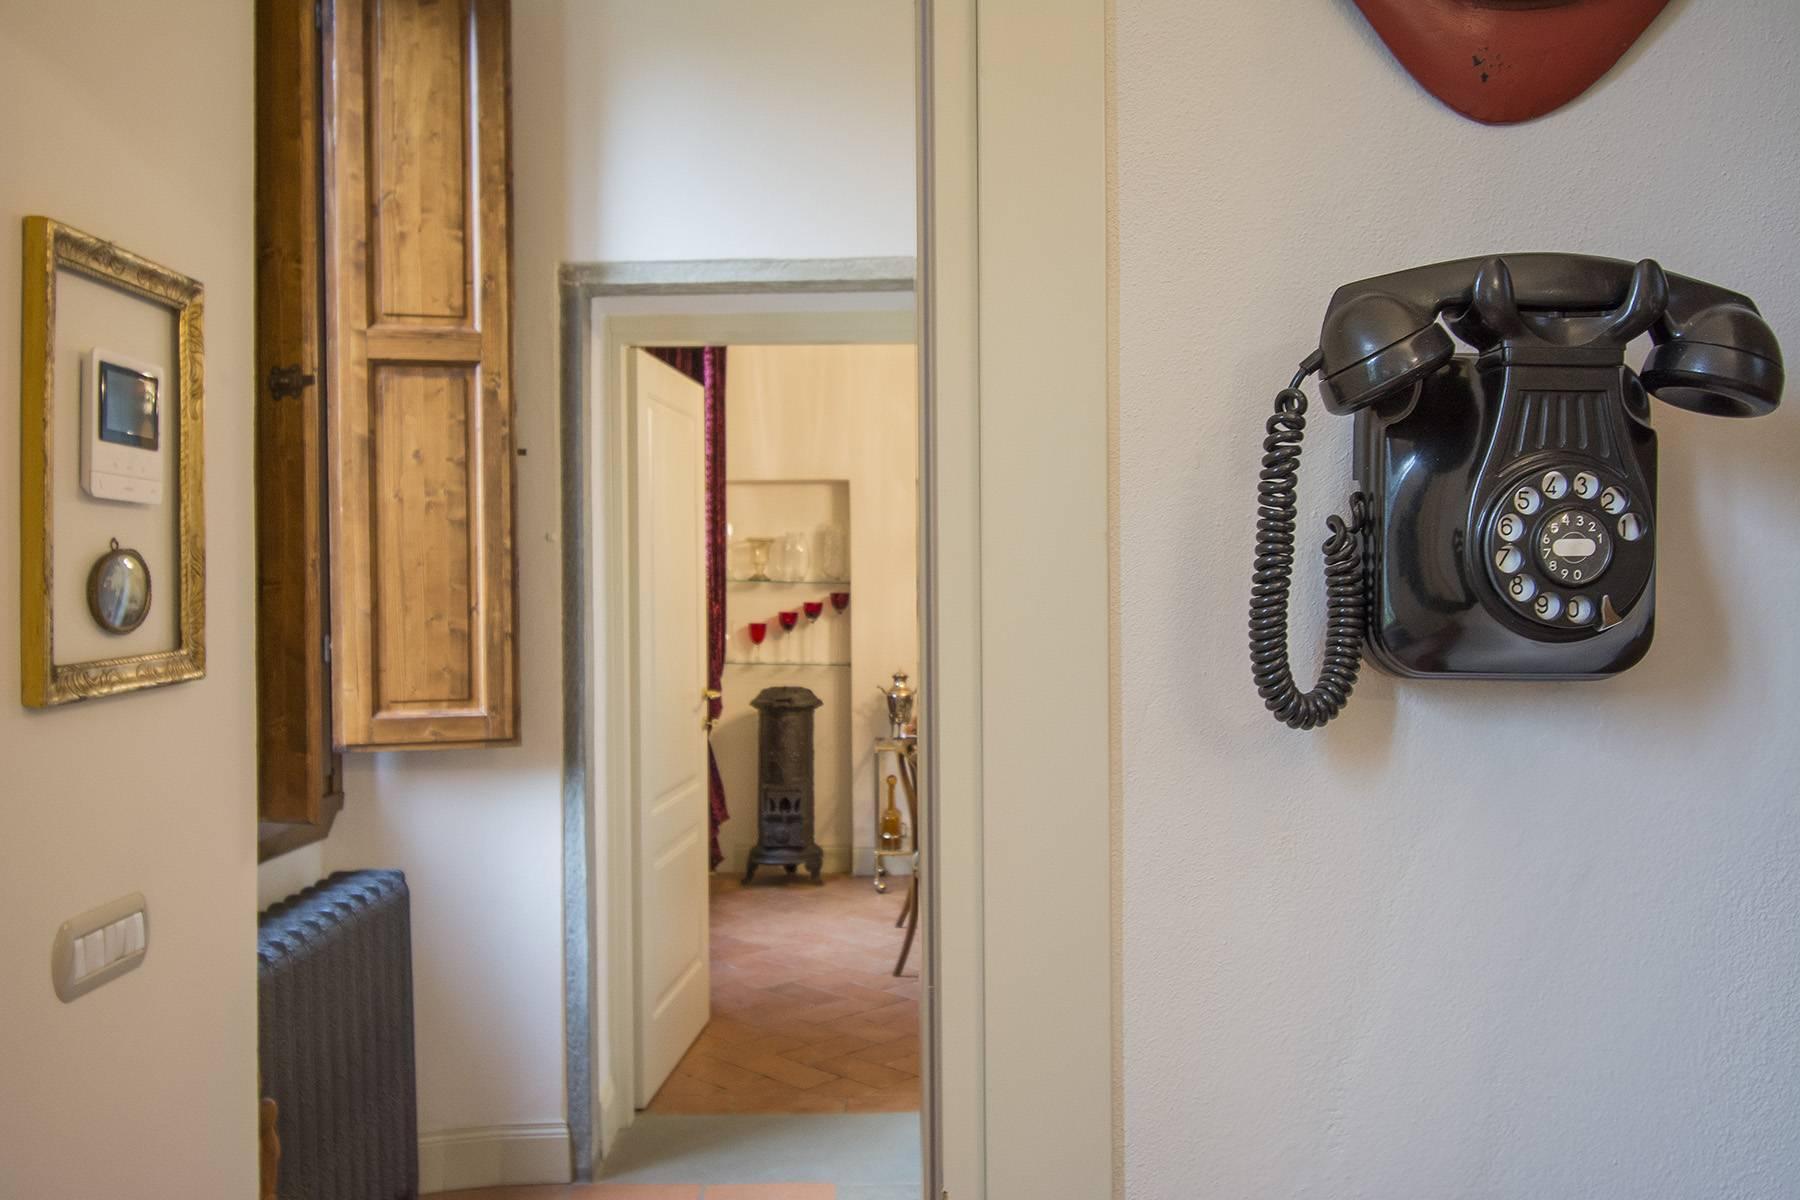 Exquisite apartment within a historic villa - 15